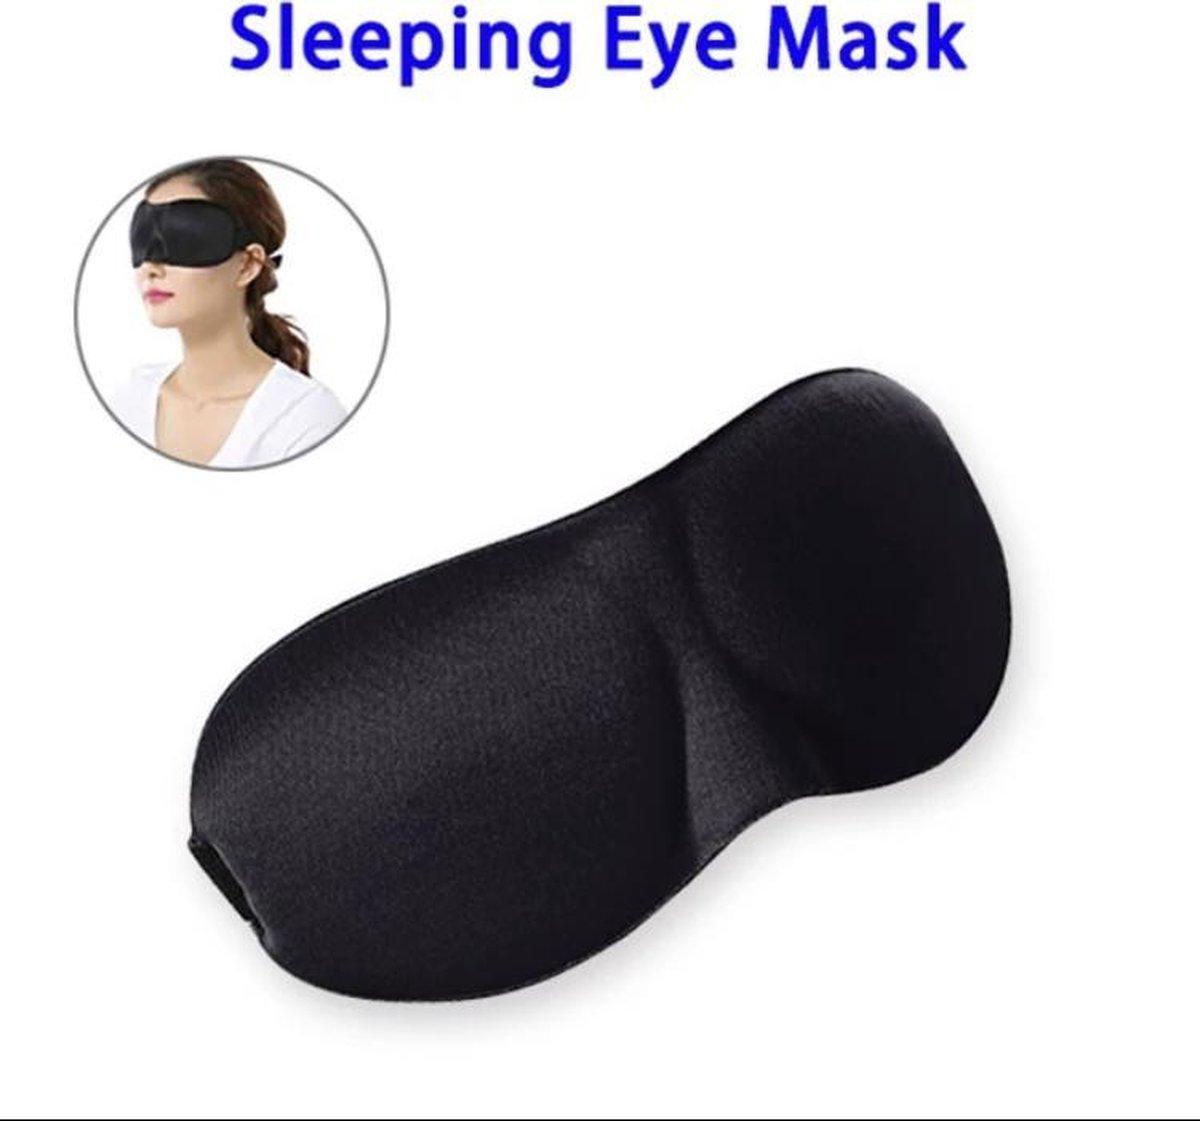 Slaapmasker - Ontspannen - slapen - Masker - oogmasker - Slaapbril - blinddoek - sleep well - eye ma